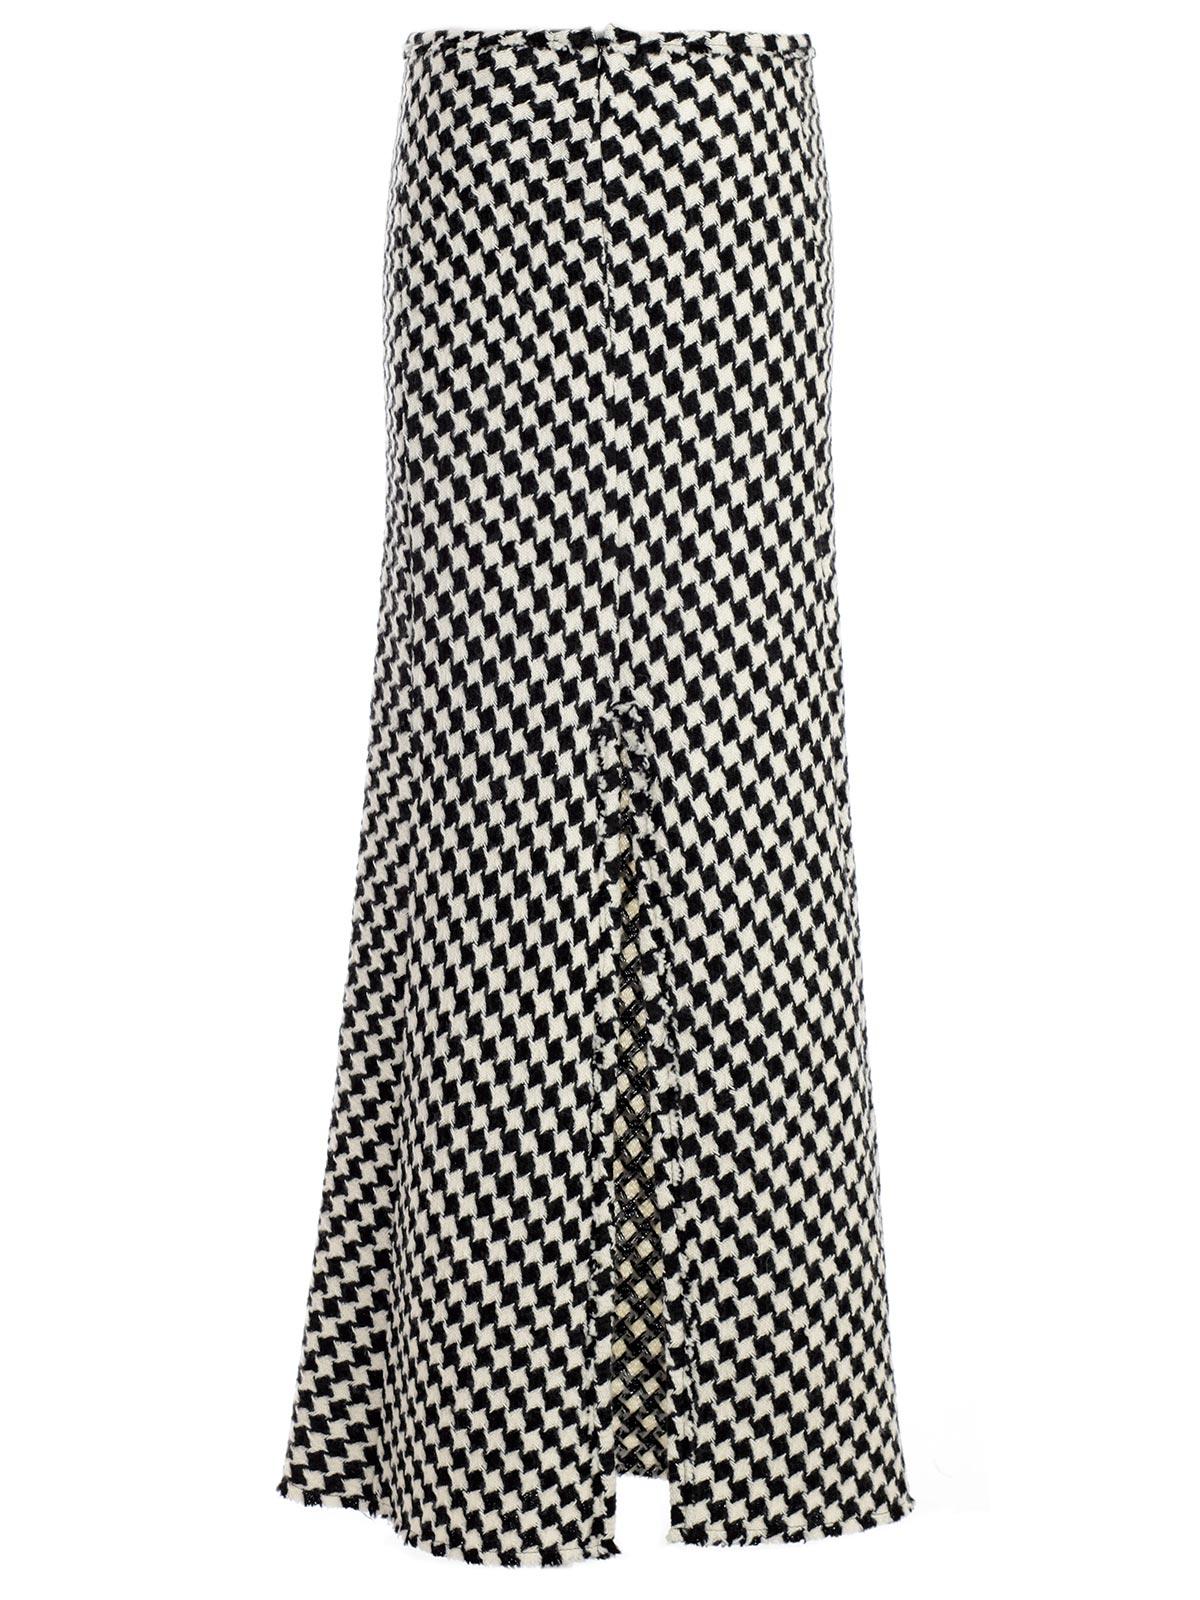 Picture of Ter Et Bantine Skirt